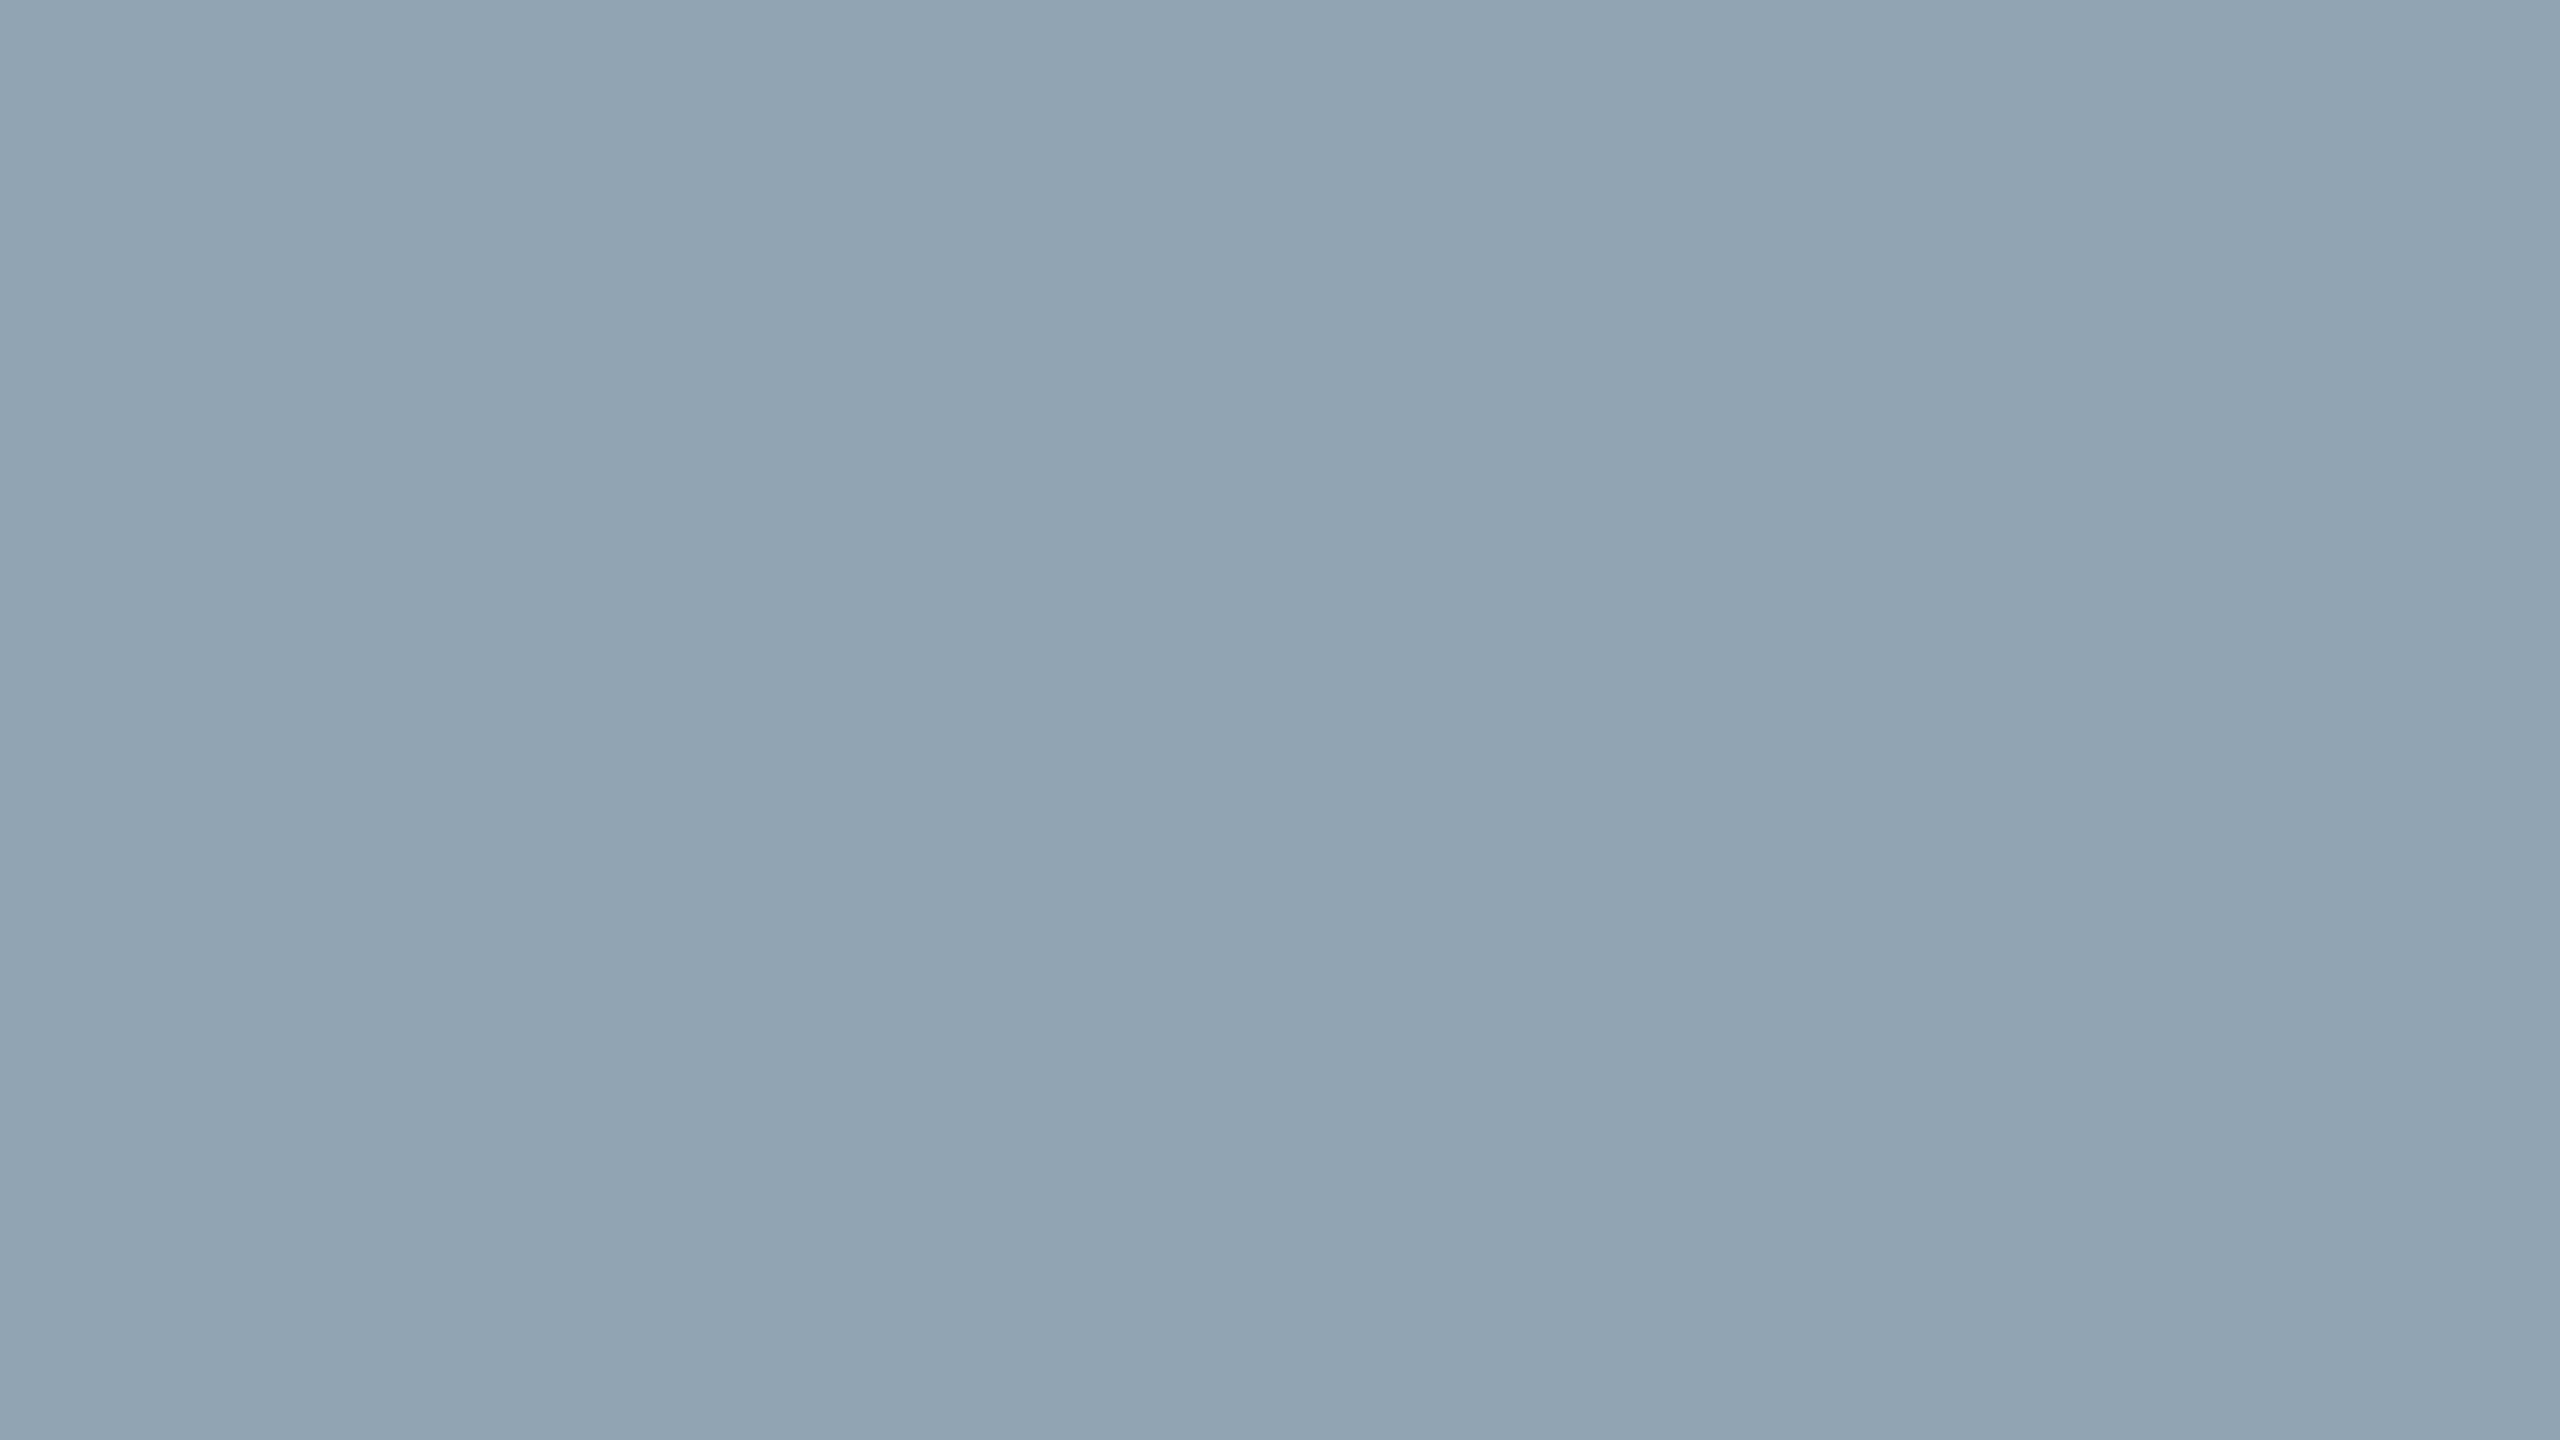 2560x1440 Cadet Grey Solid Color Background